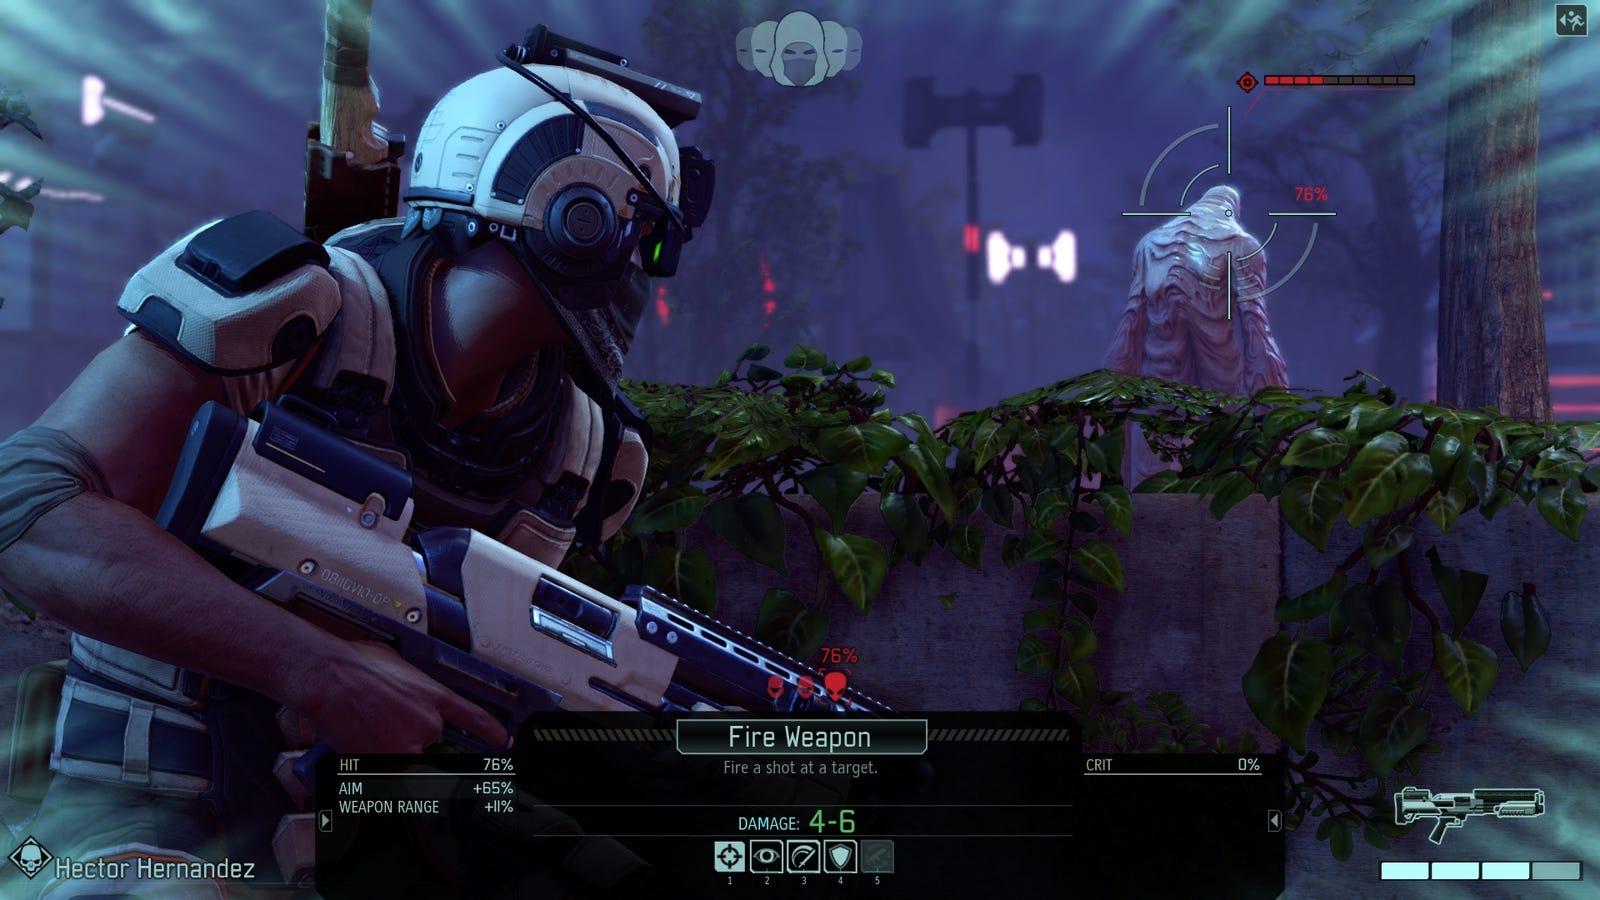 Seven Mods That Make XCOM 2 Less Frustrating